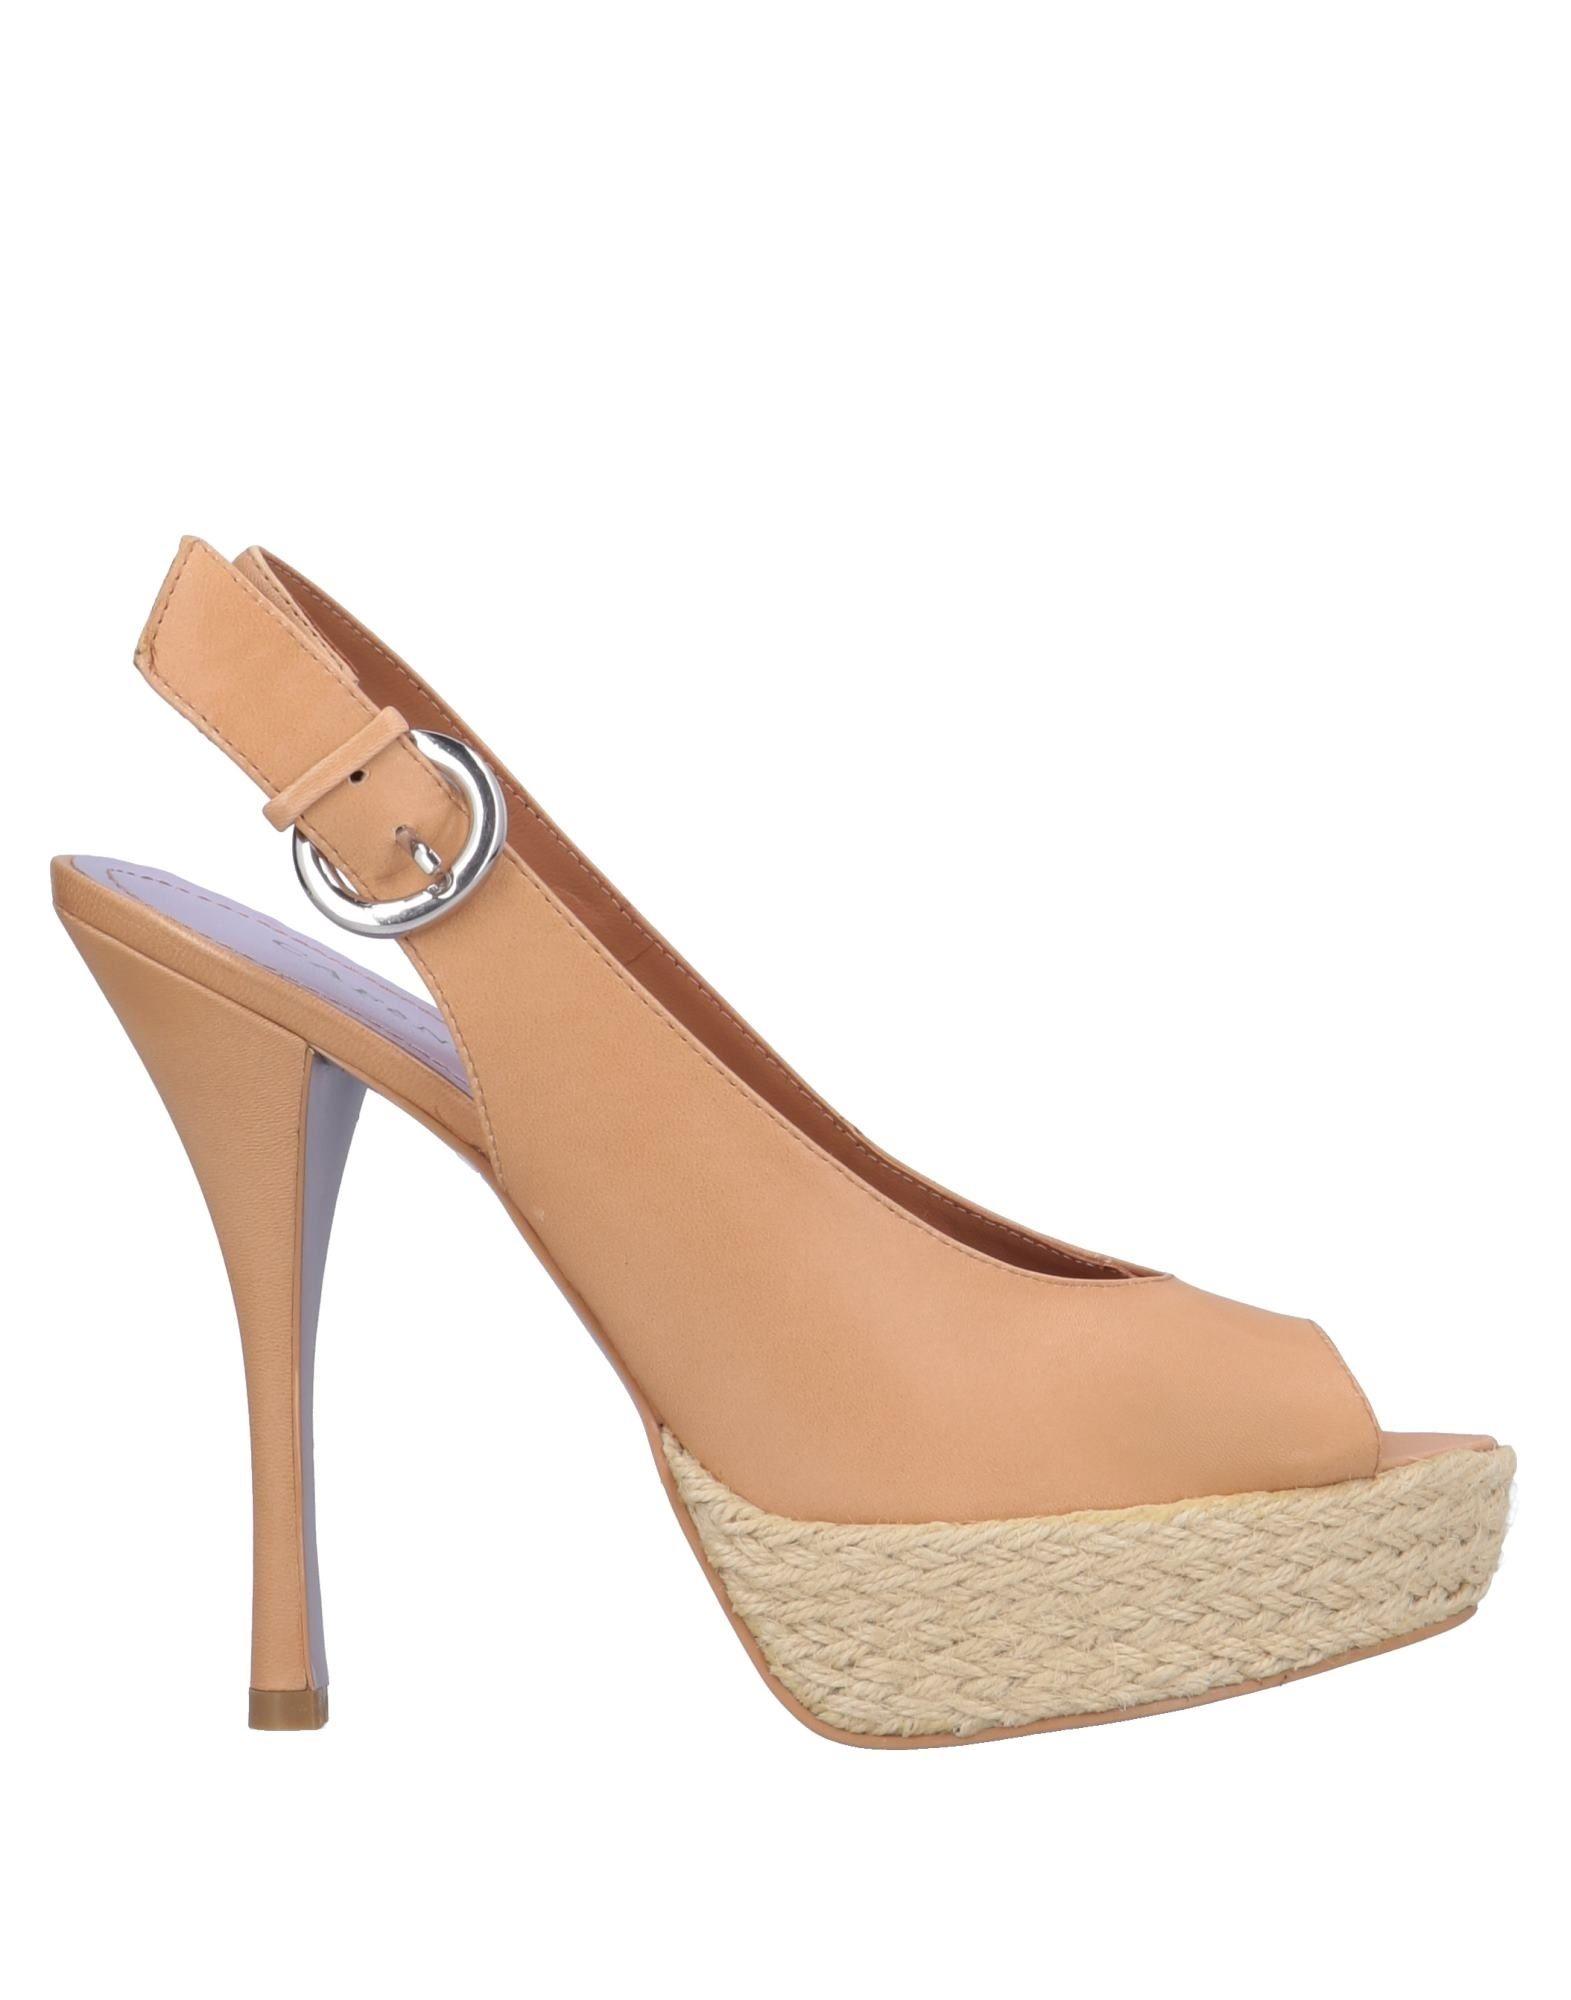 Cafènoir Sandals Sandals - Women Cafènoir Sandals Cafènoir online on  United Kingdom - 44615141VE b5266d